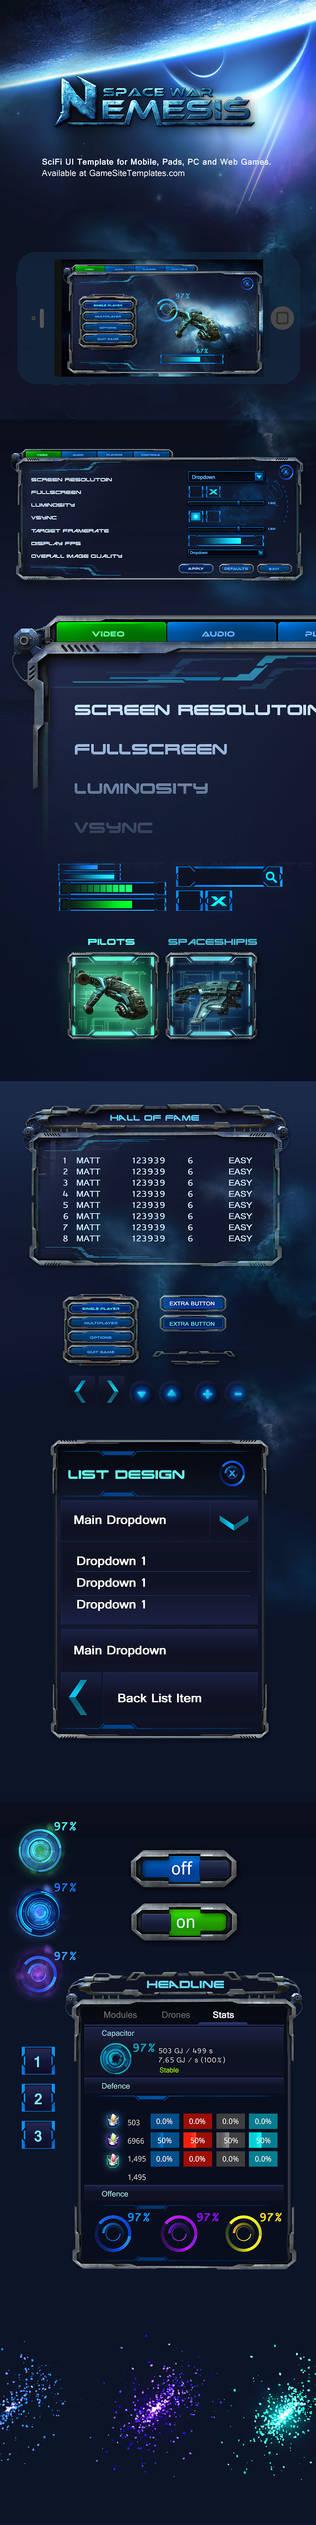 SpaceWar-SciFi-Mobile-Game-GUI-Interface-04